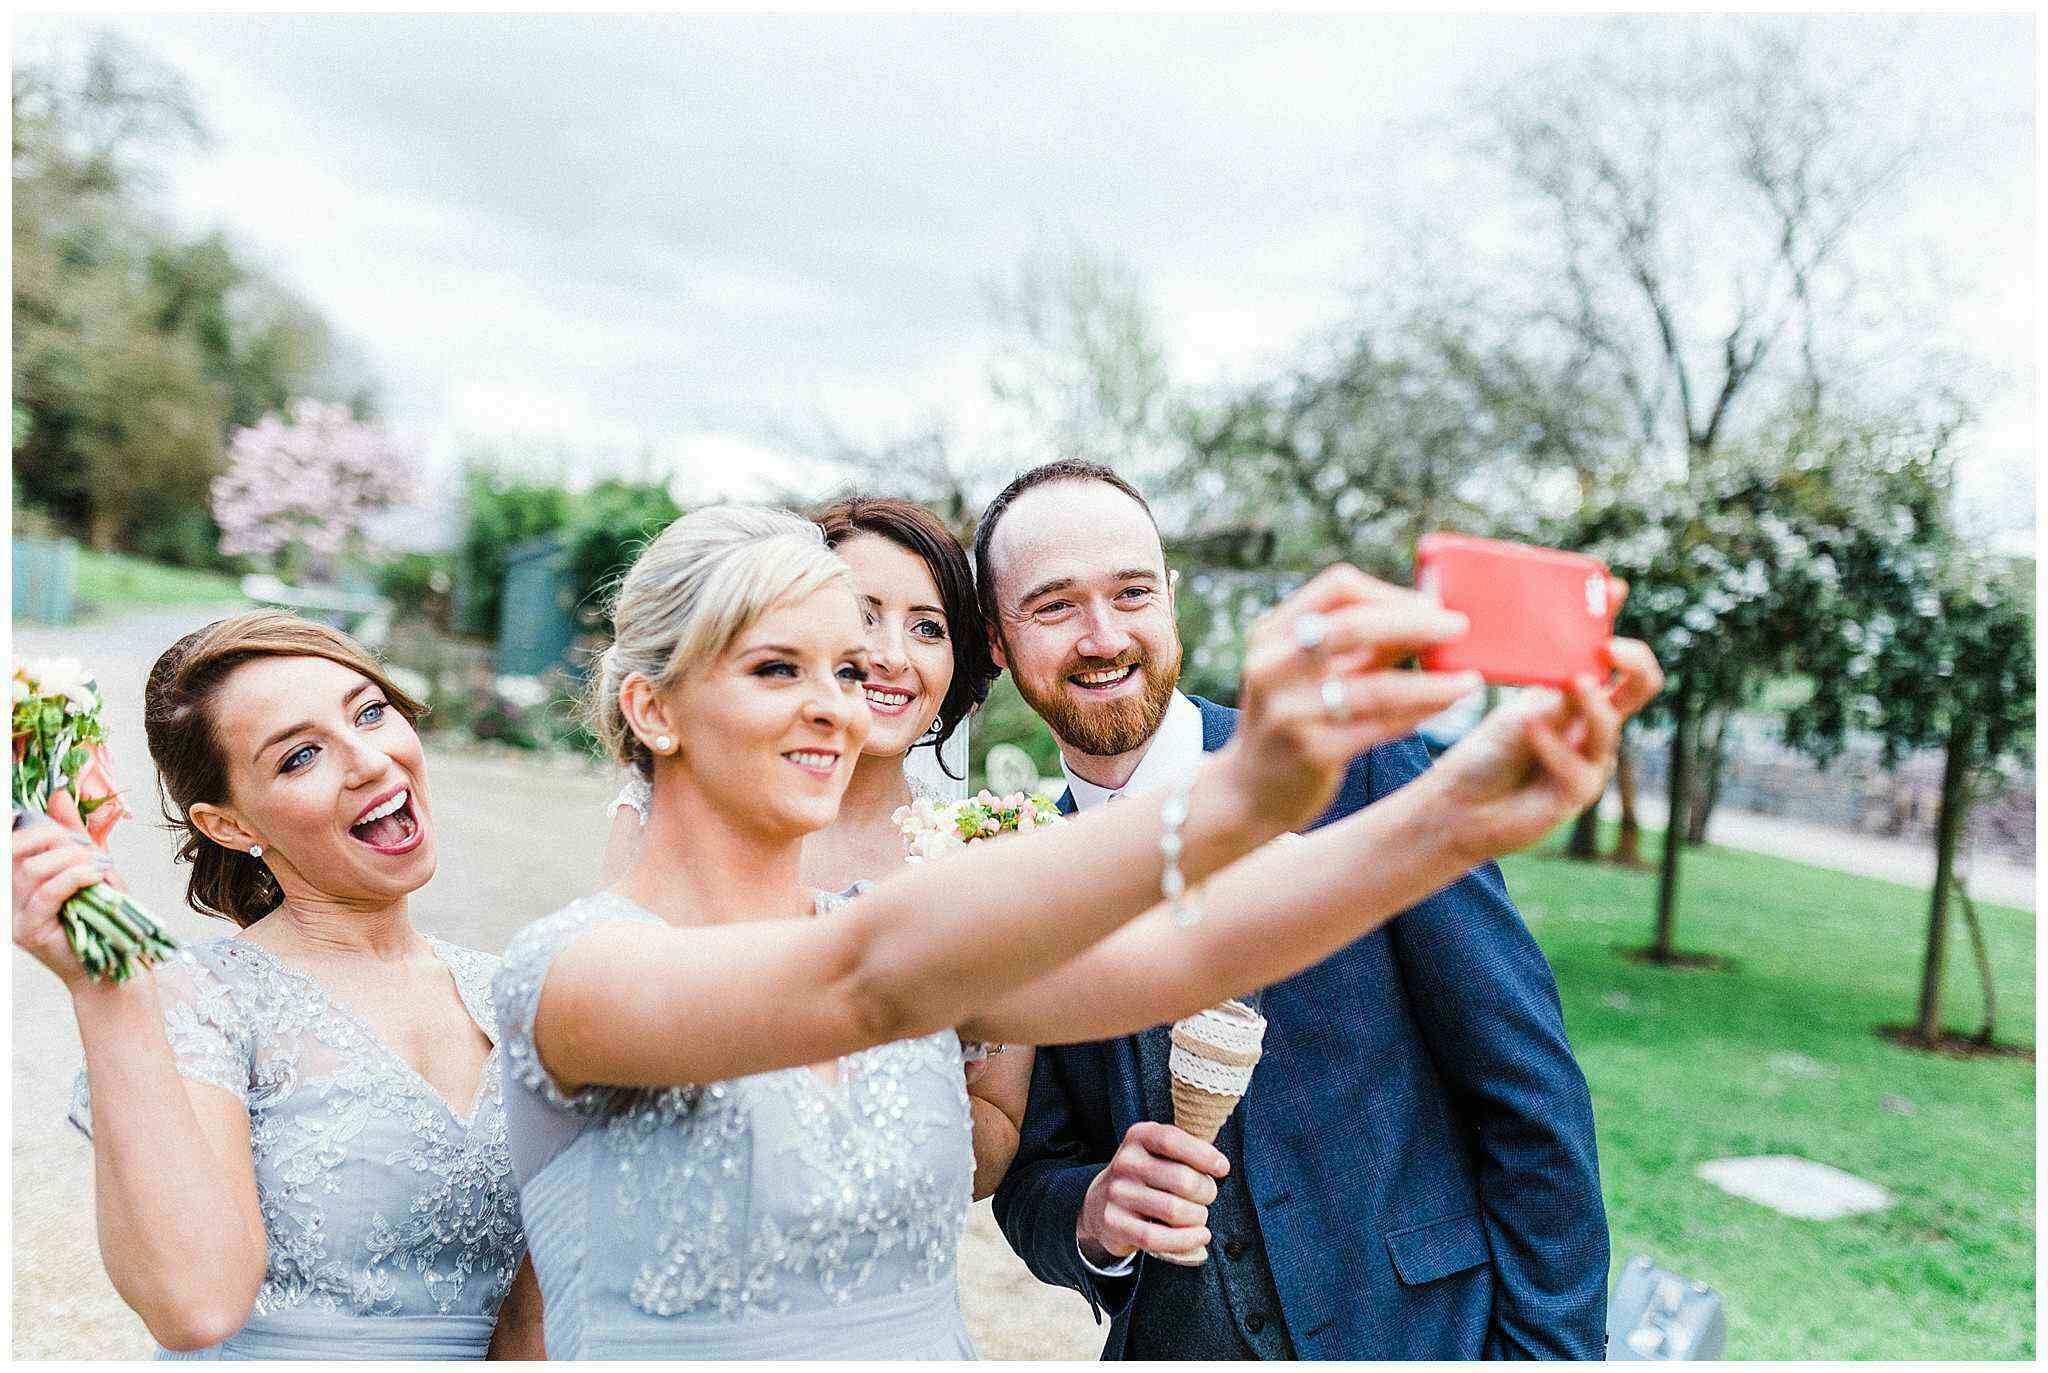 Nicola + Brendan's Wedding at the Millhouse Slane 42